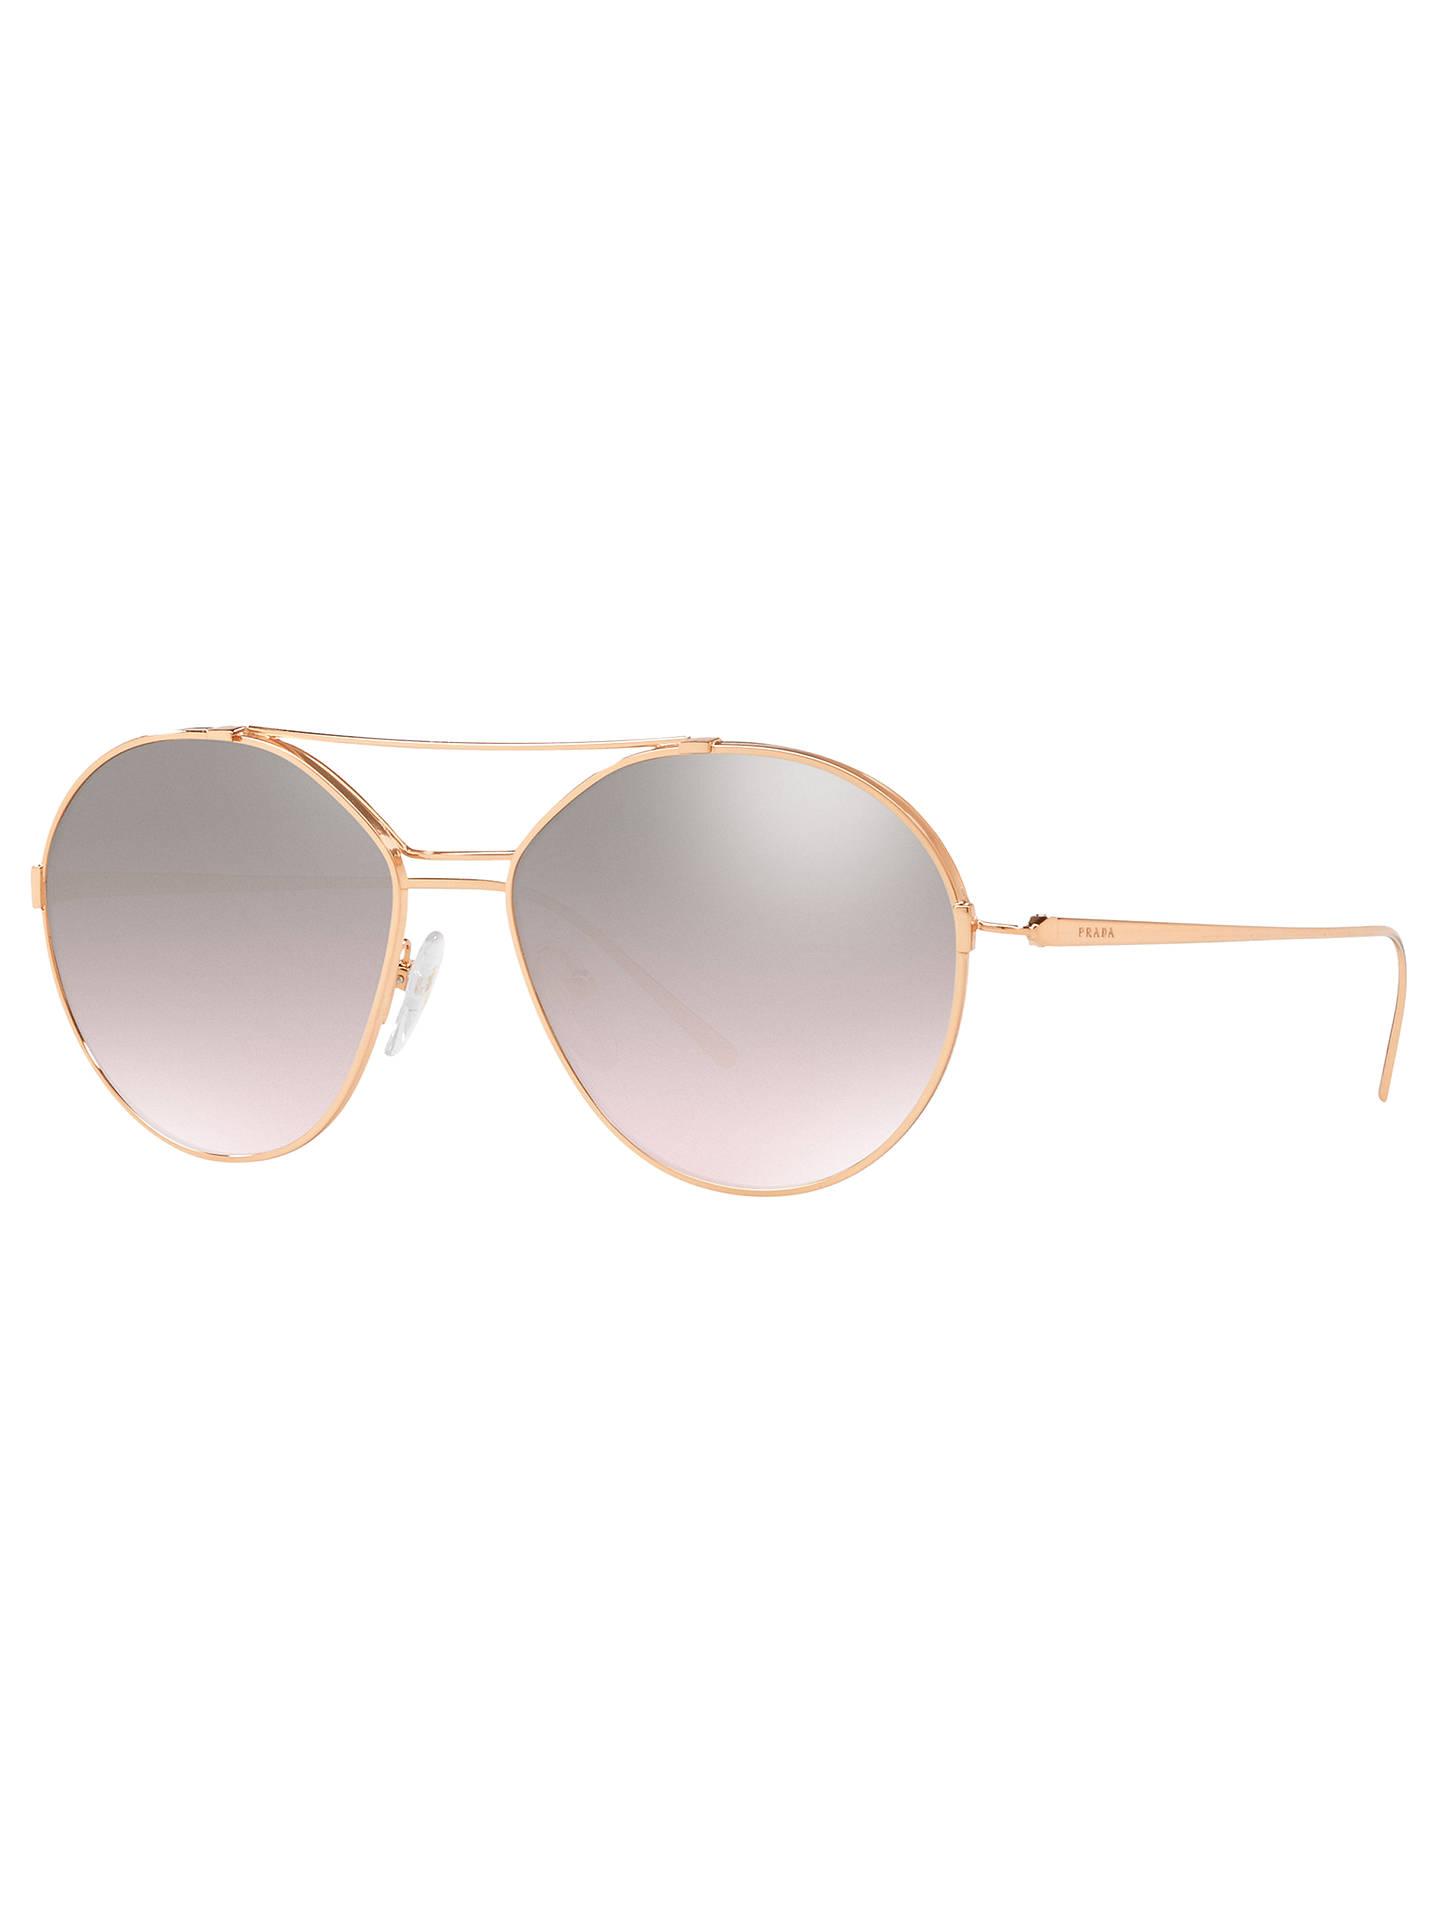 caf71aca43940 Buy Prada 56US Women s Geometric Sunglasses